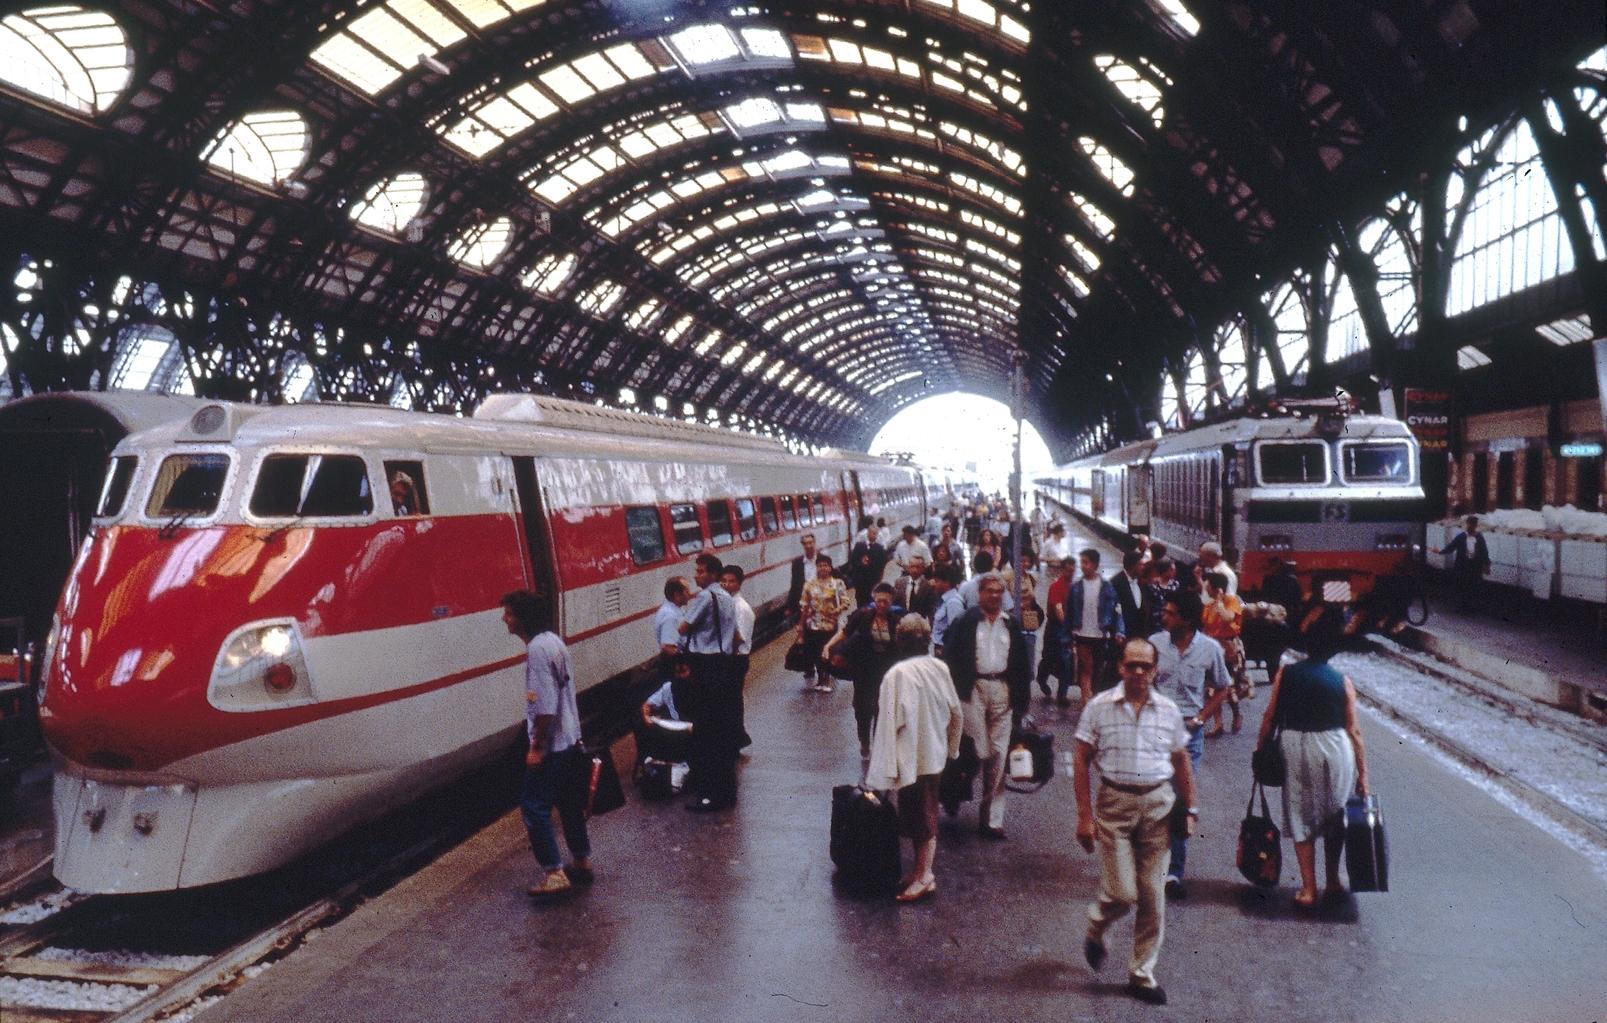 Foto Archivio Alstom